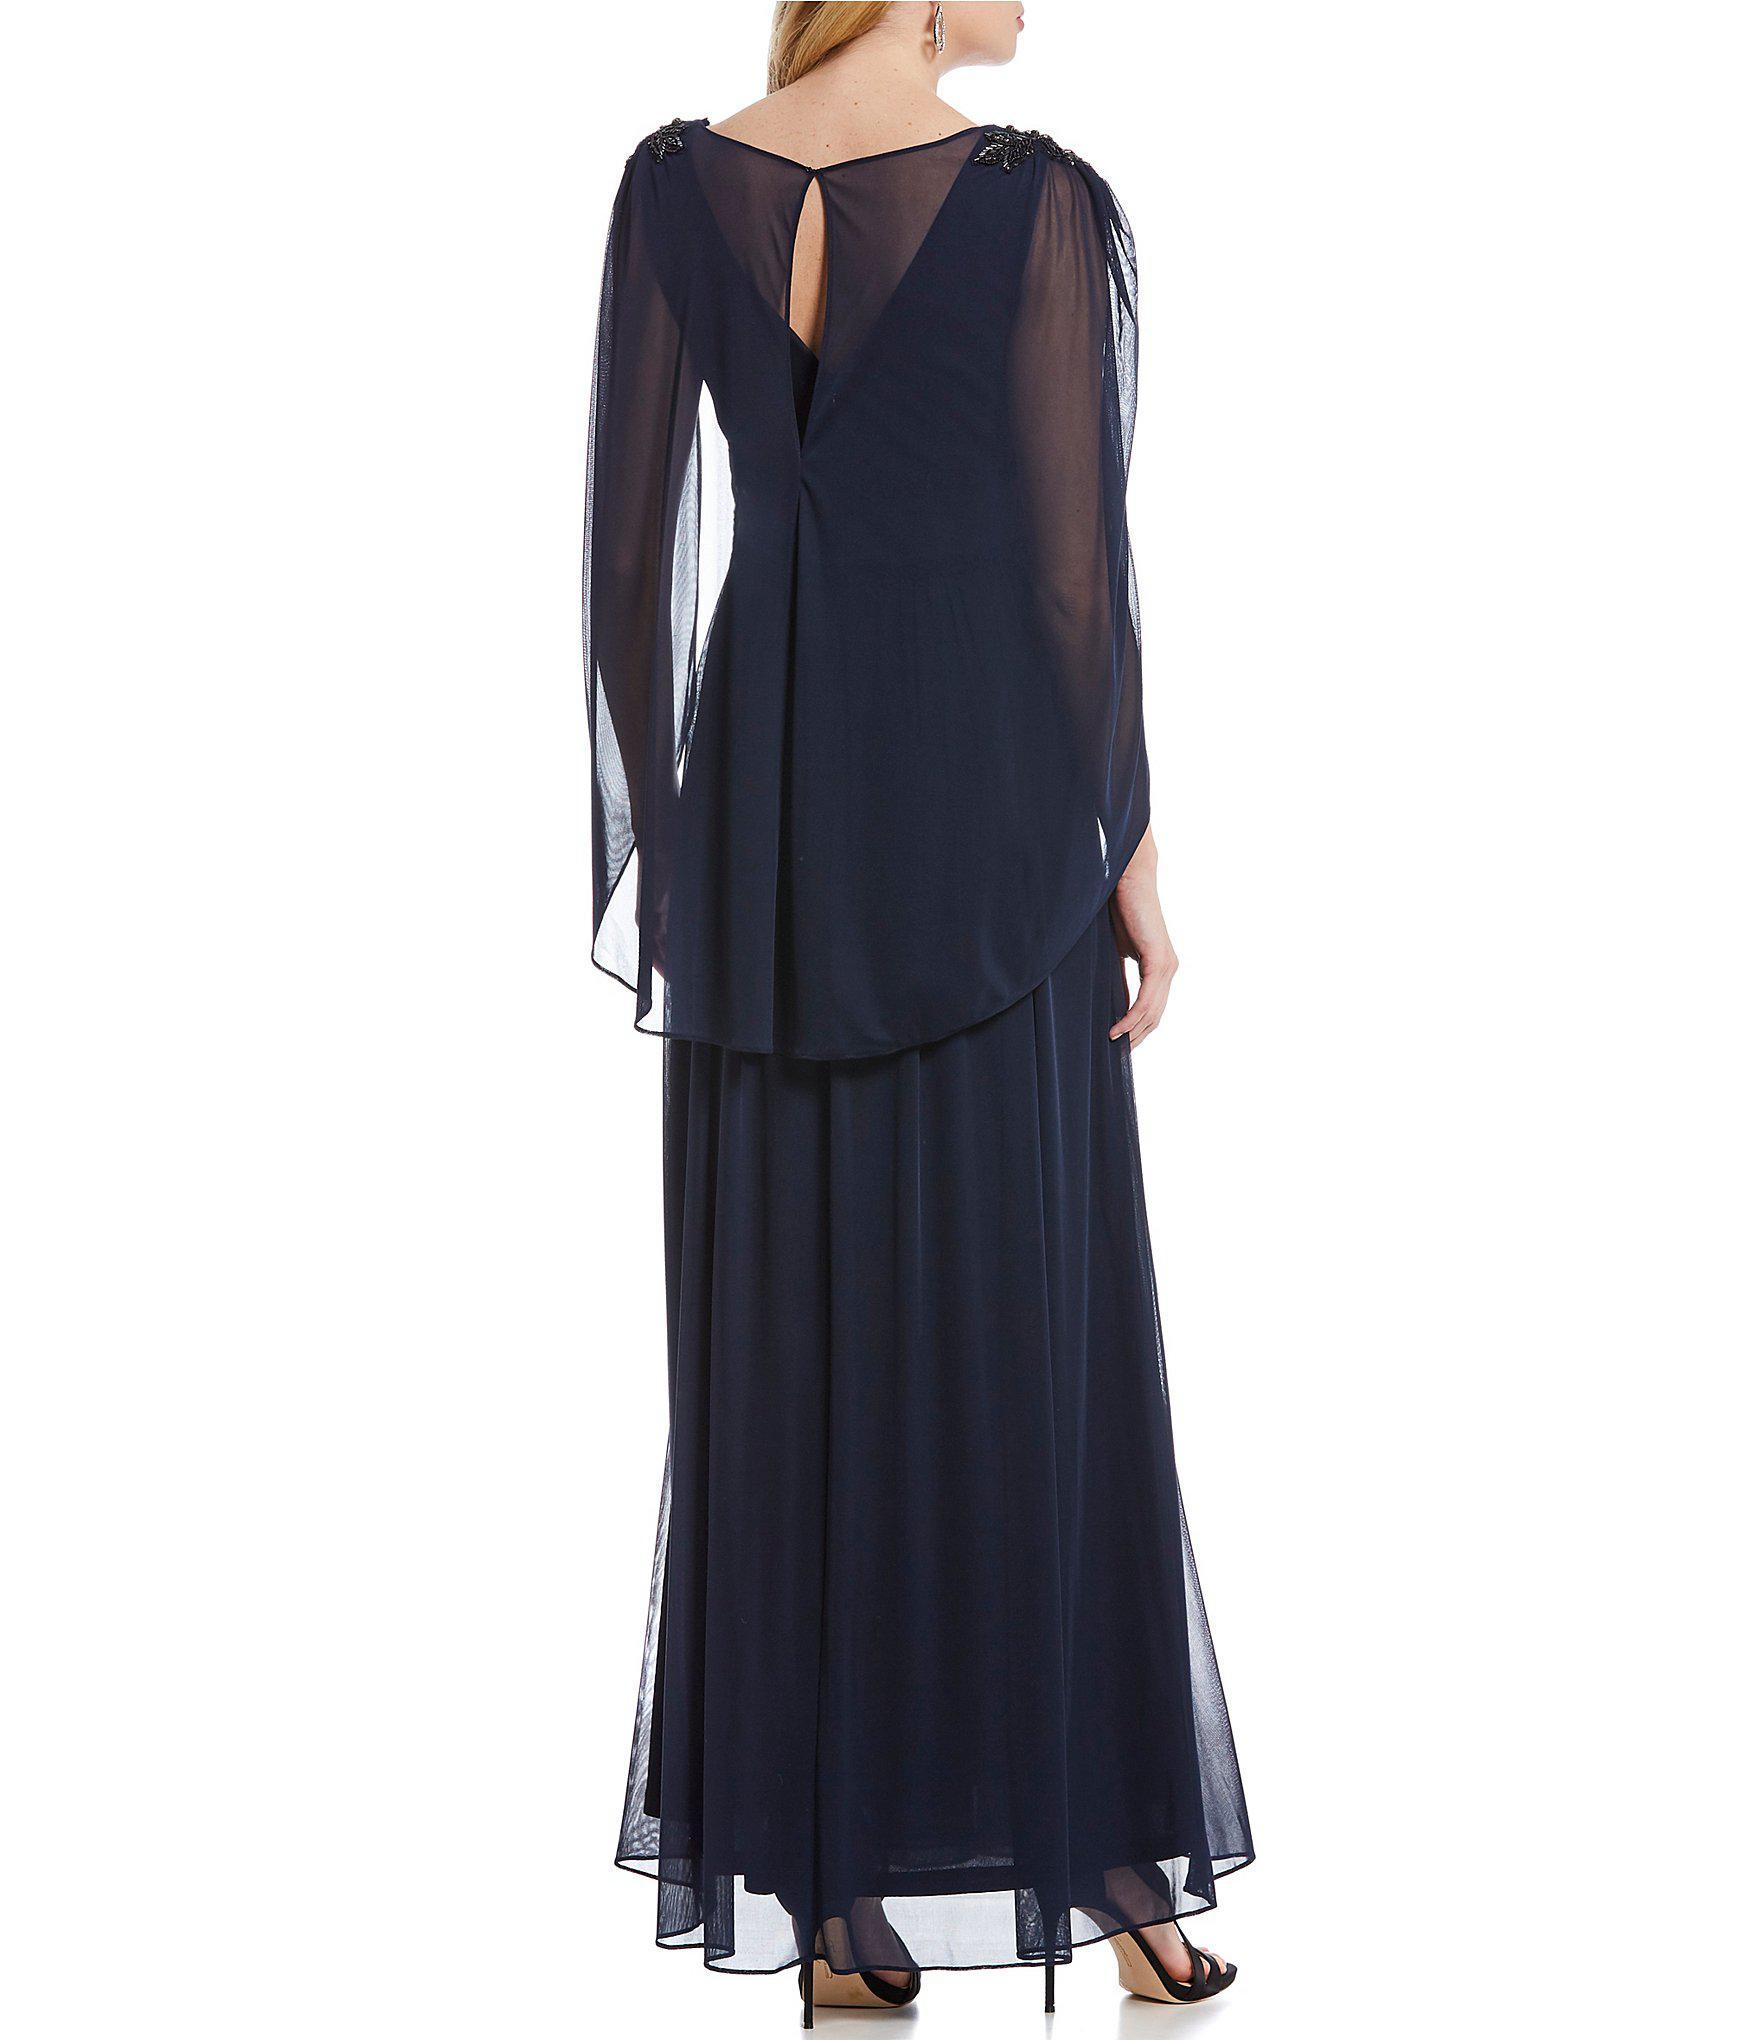 3db0e250071e0 Adrianna Papell - Blue Chiffon Beaded Shoulder Capelet Gown - Lyst. View  fullscreen